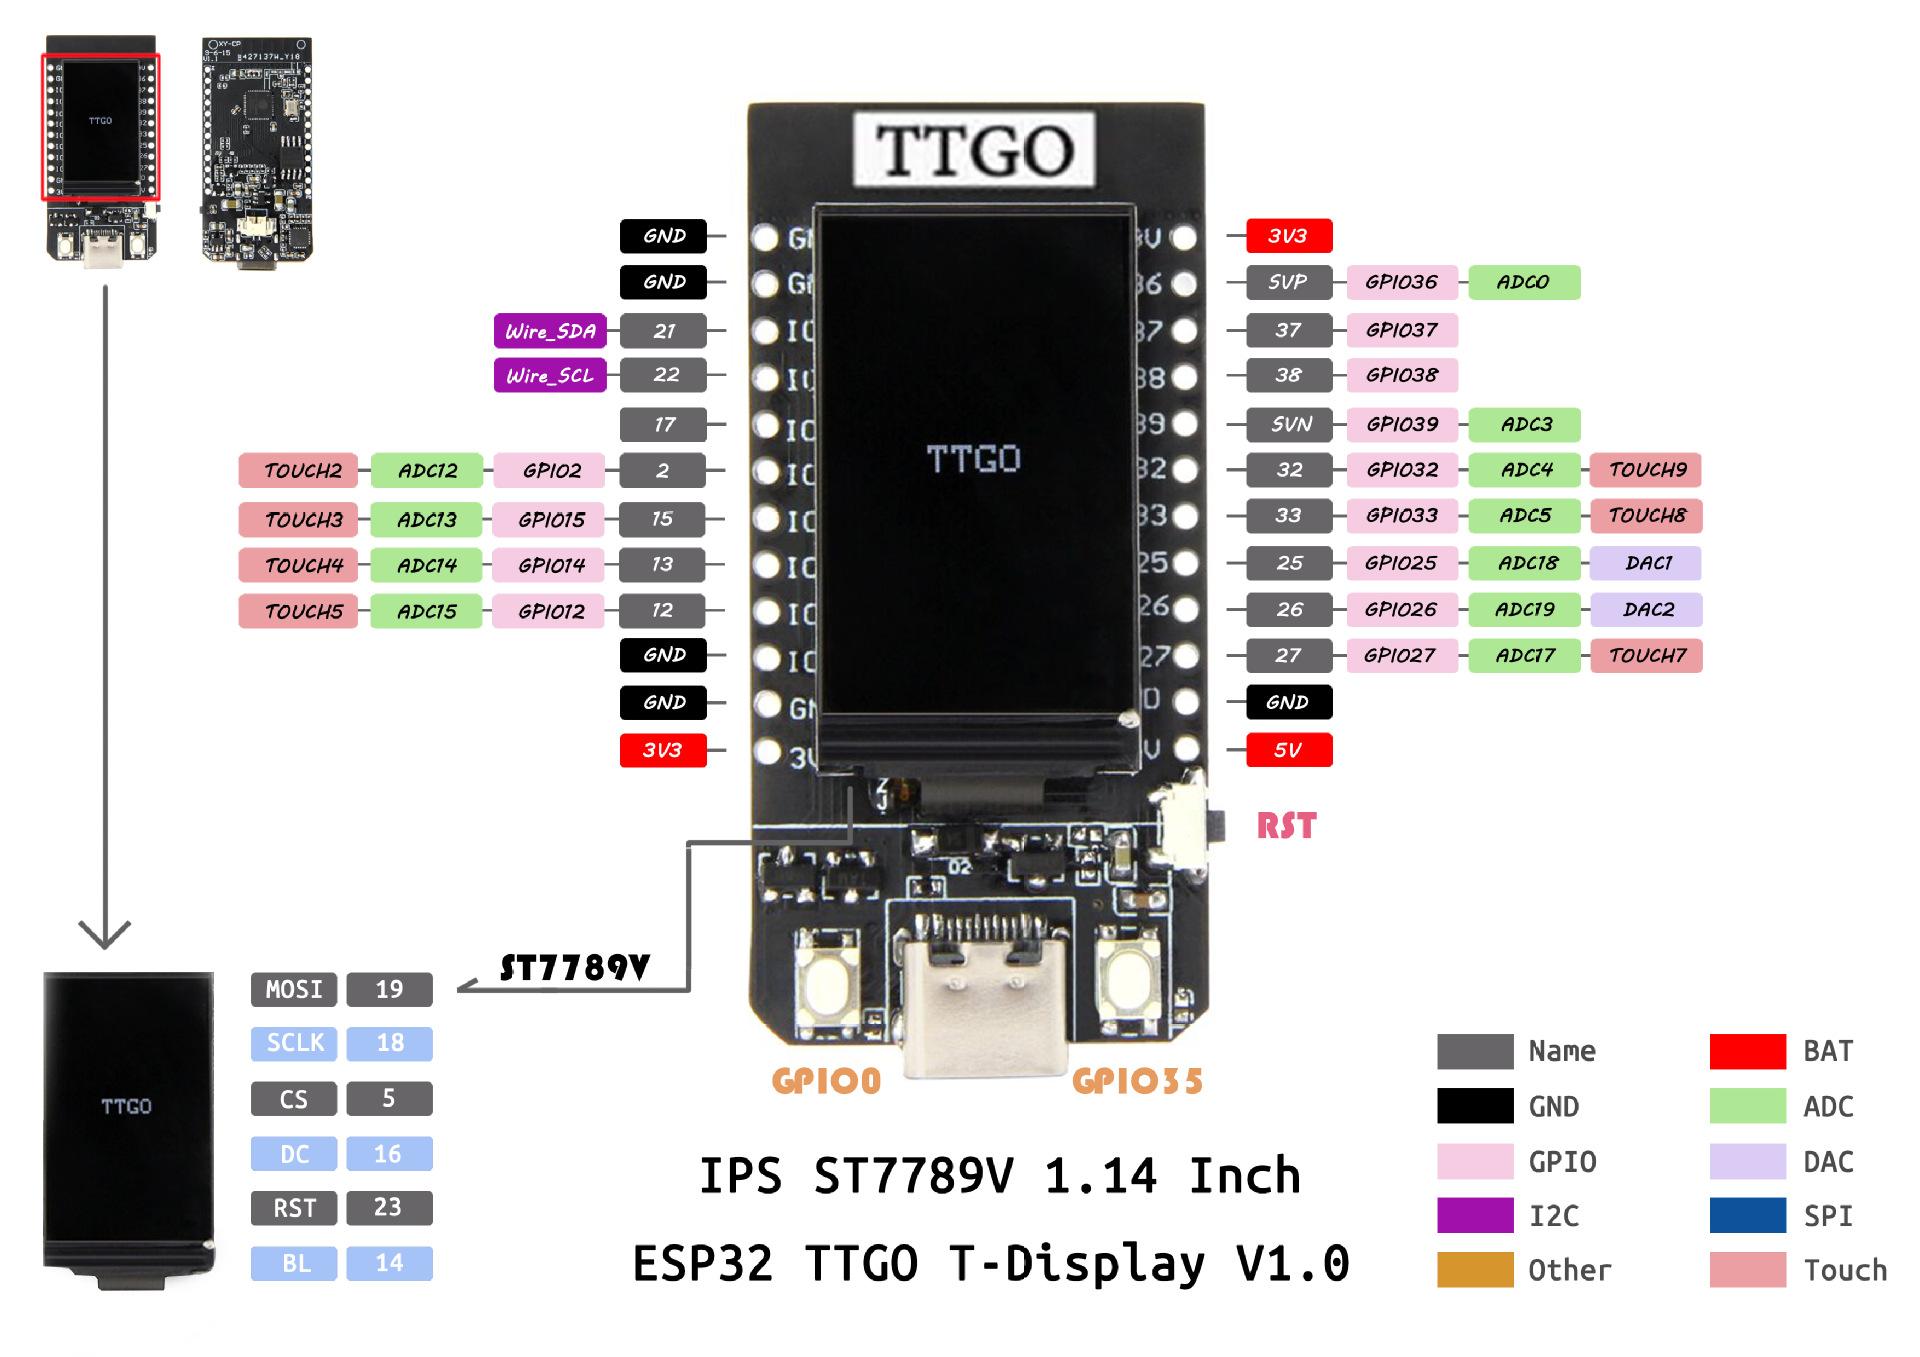 LILYGO® TTGO T-Display ESP32 CP2104 WiFi bluetooth Module 1.14 Inch LCD Development Board For Arduino